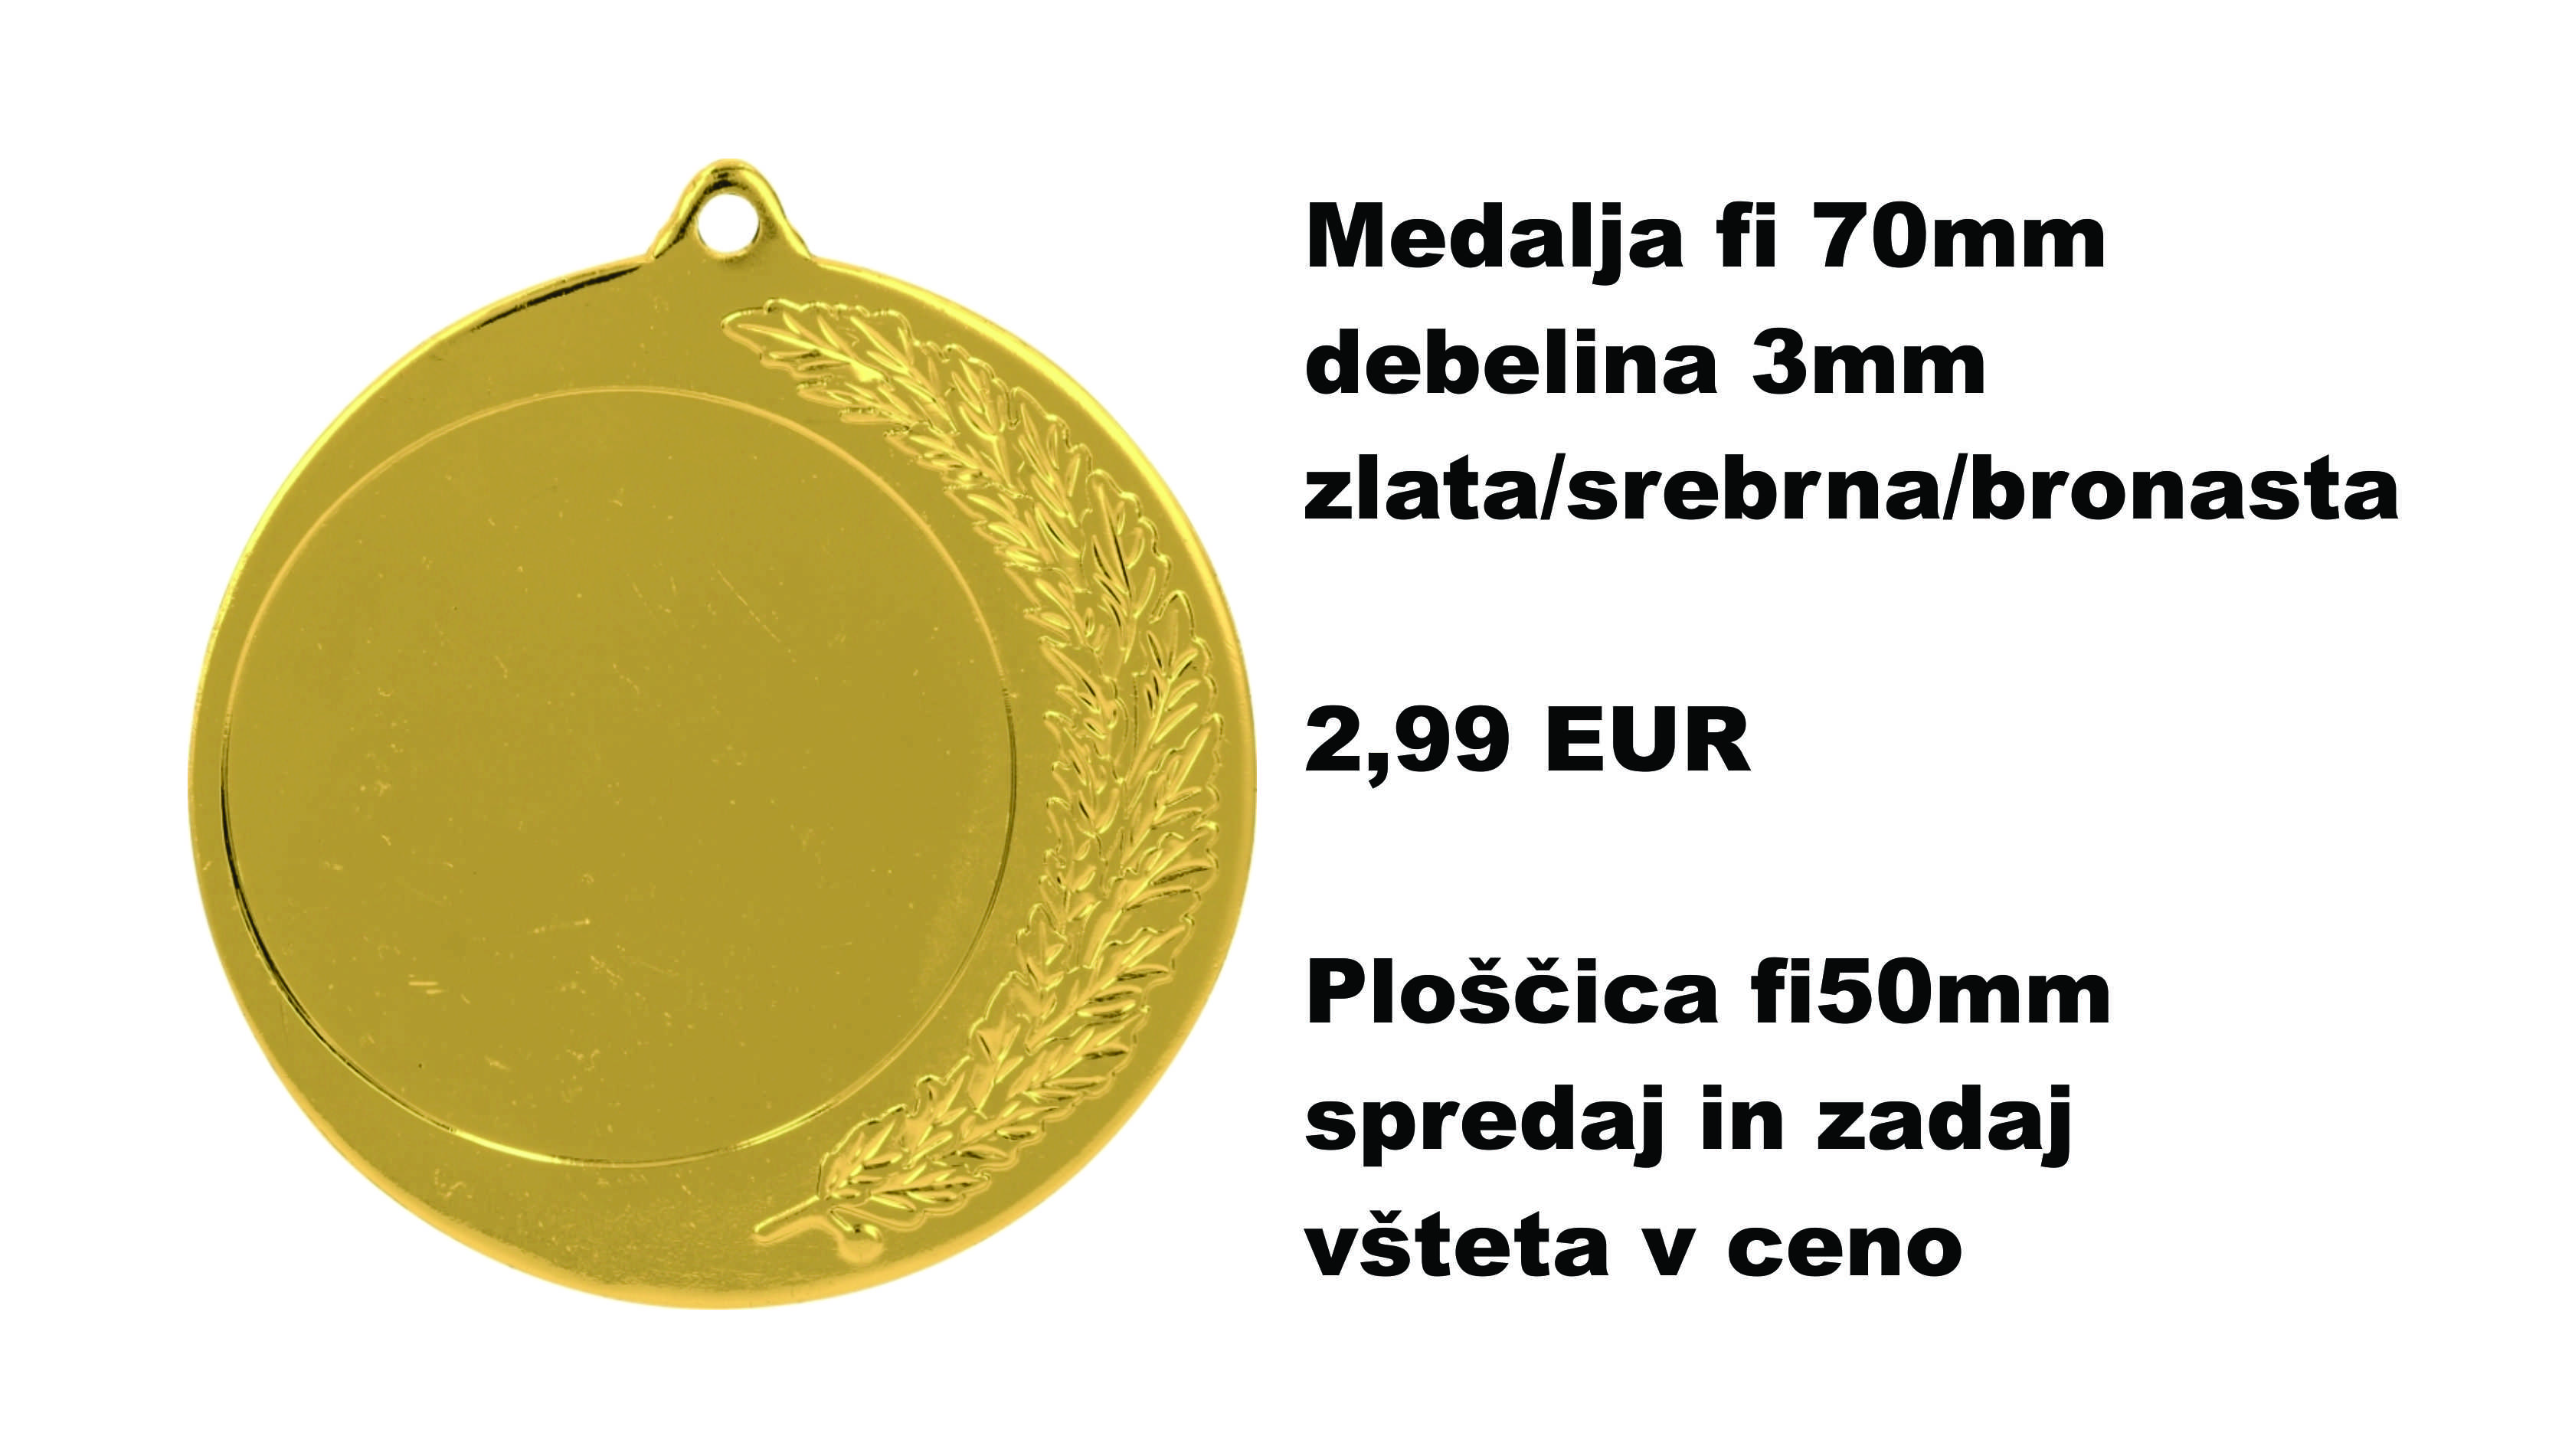 medalja 70